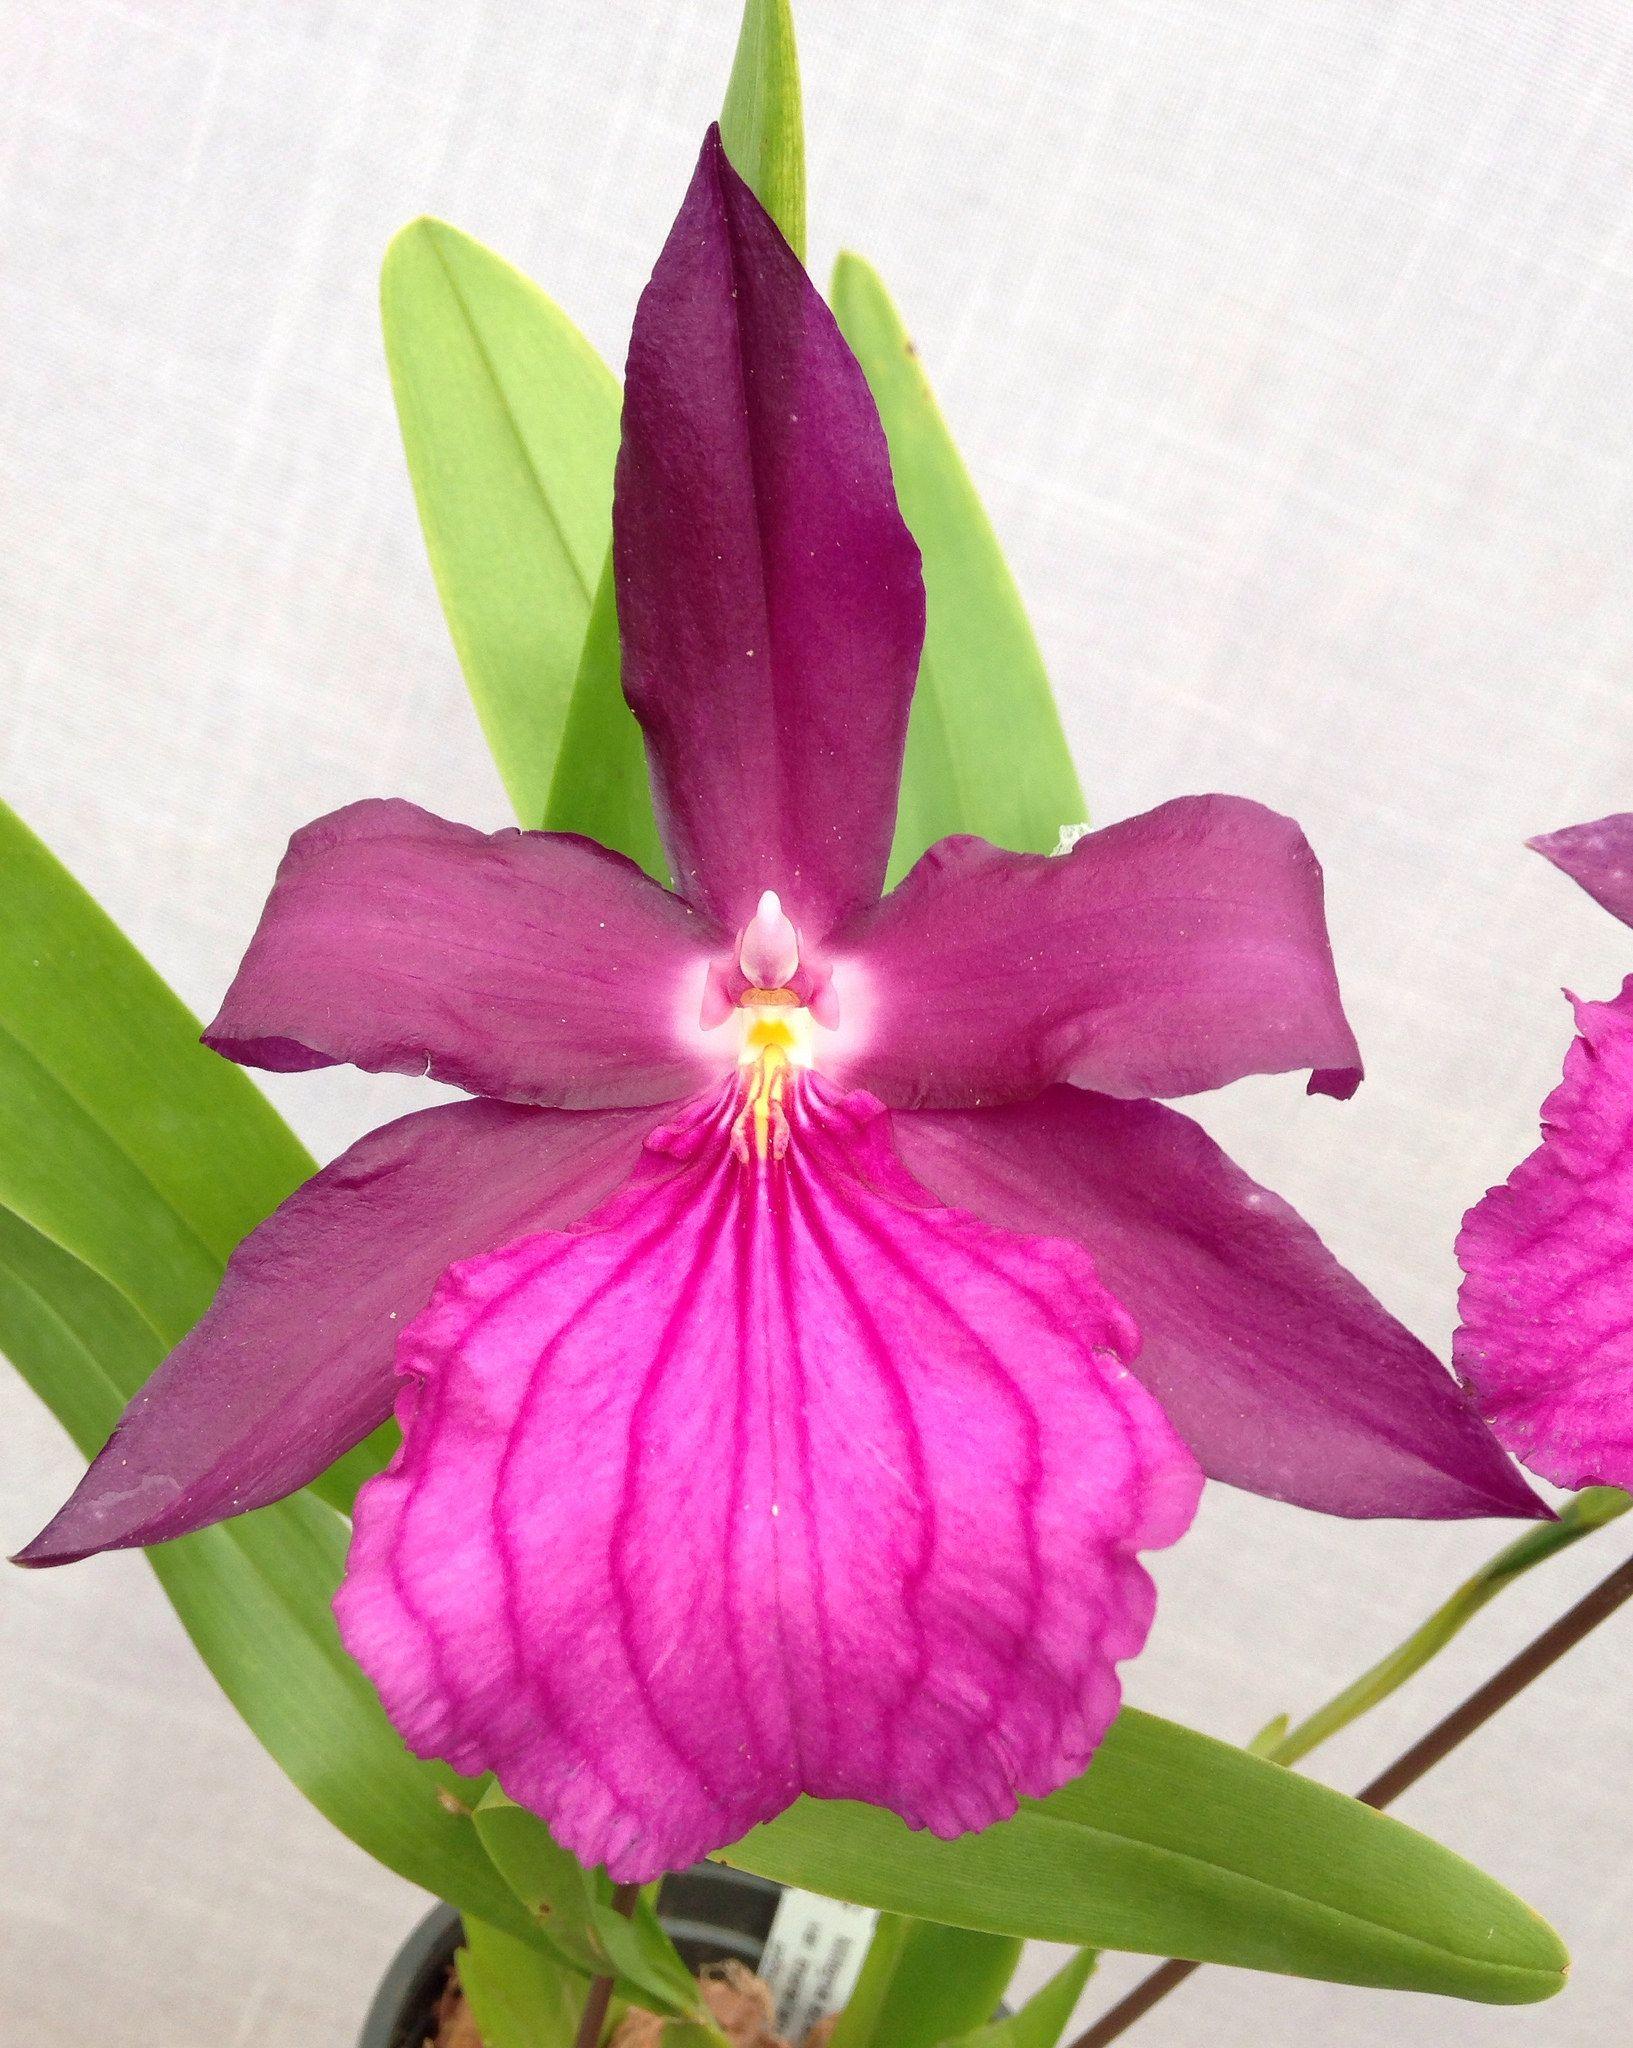 Miltonia spectabilis var moreliana ch miltonia purple